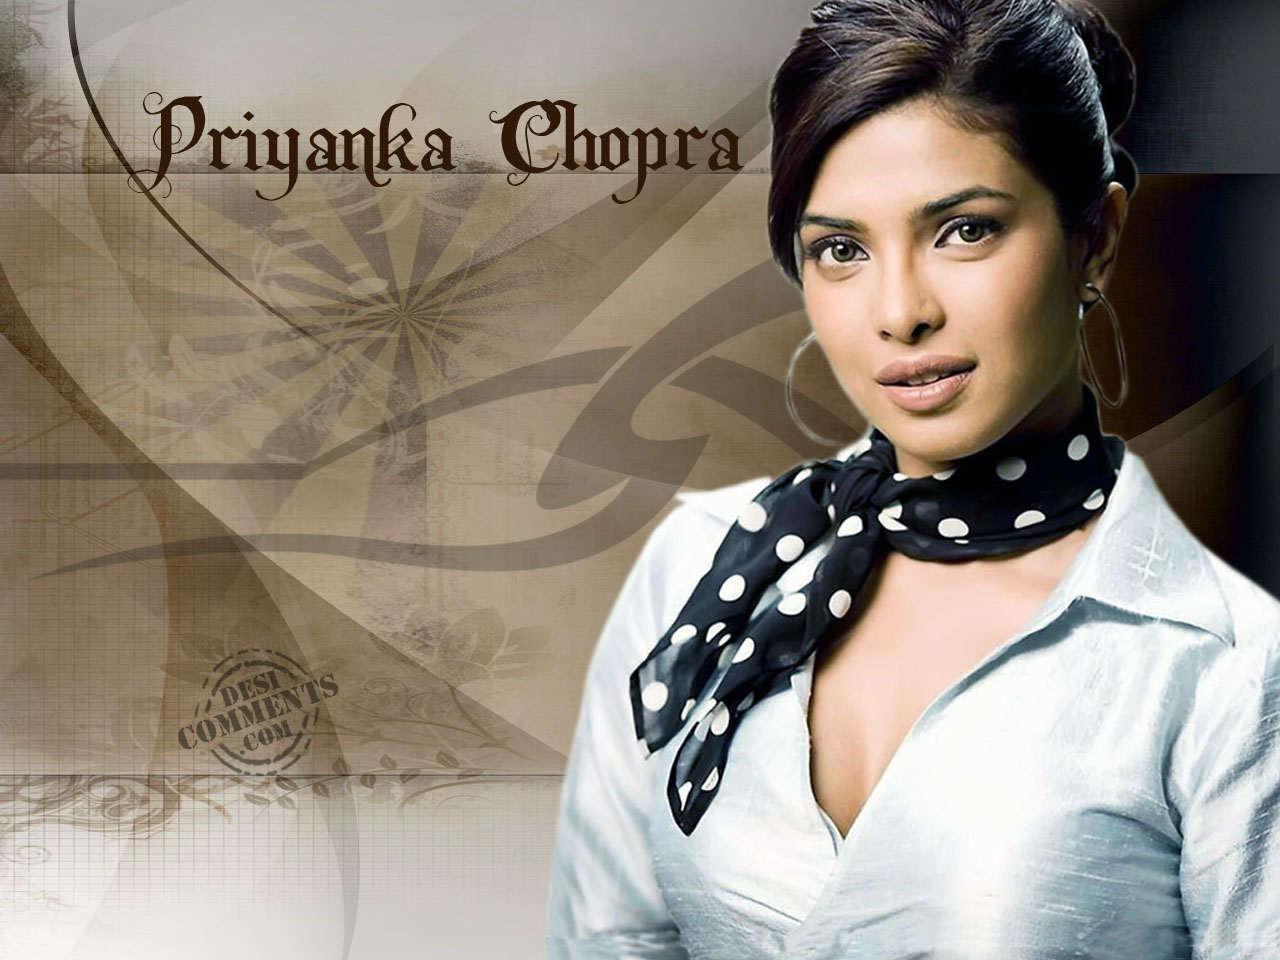 IMAGE WORLD: Priyanka Chopra Hot & Beautiful Photos And Wiki